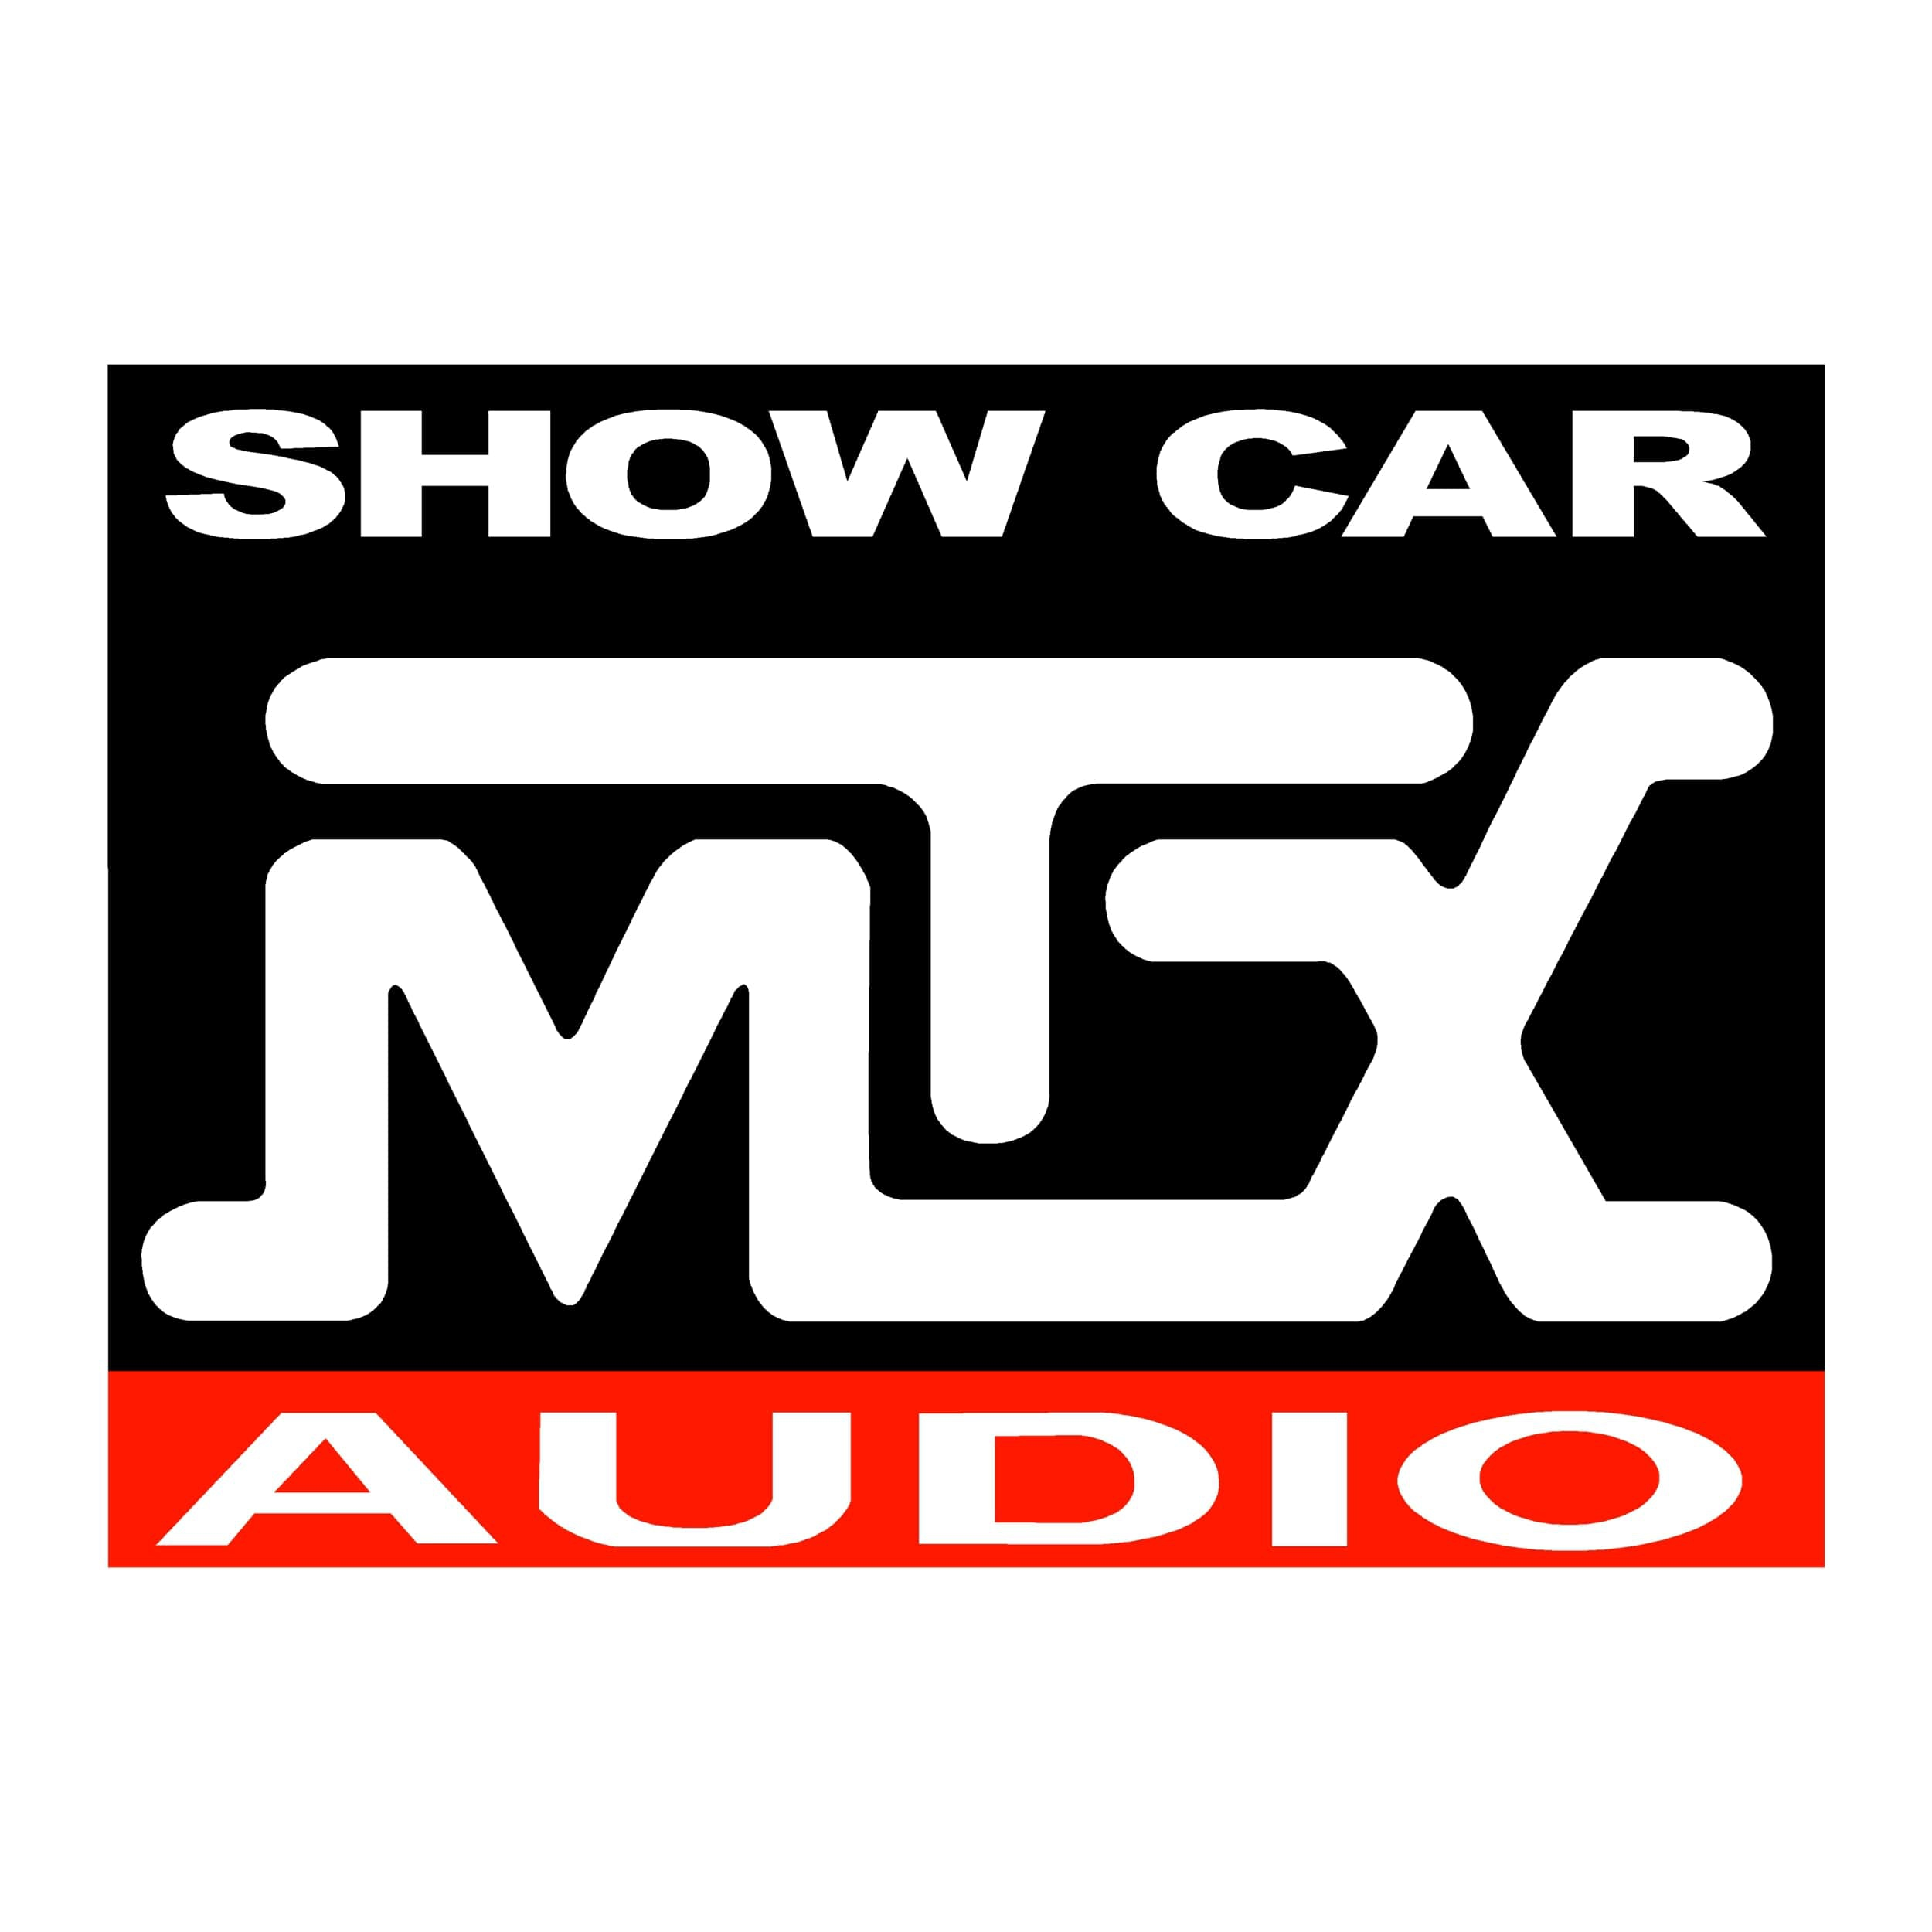 stickers-mtx-ref-4-tuning-audio-4x4-sonorisation-car-auto-moto-camion-competition-deco-rallye-autocollant-min